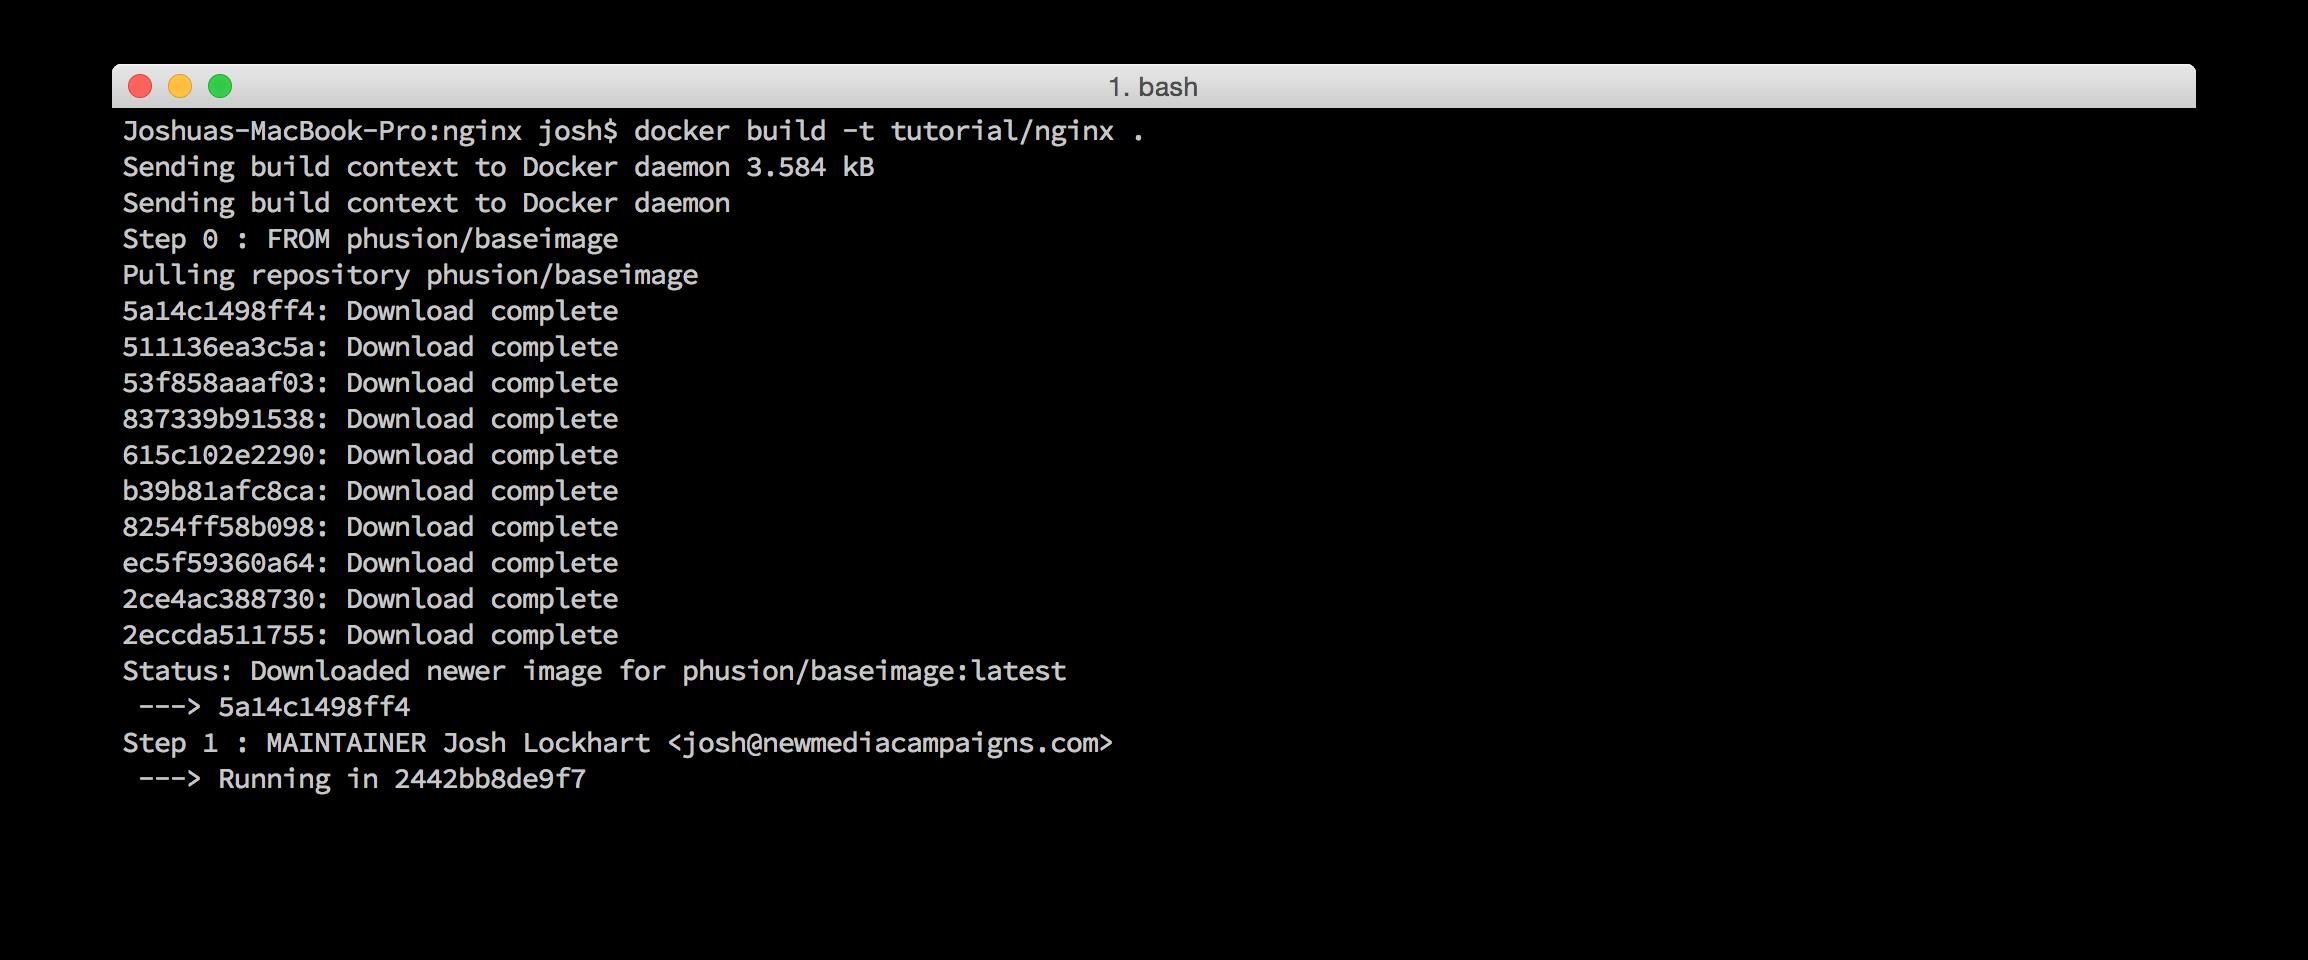 Docker build command